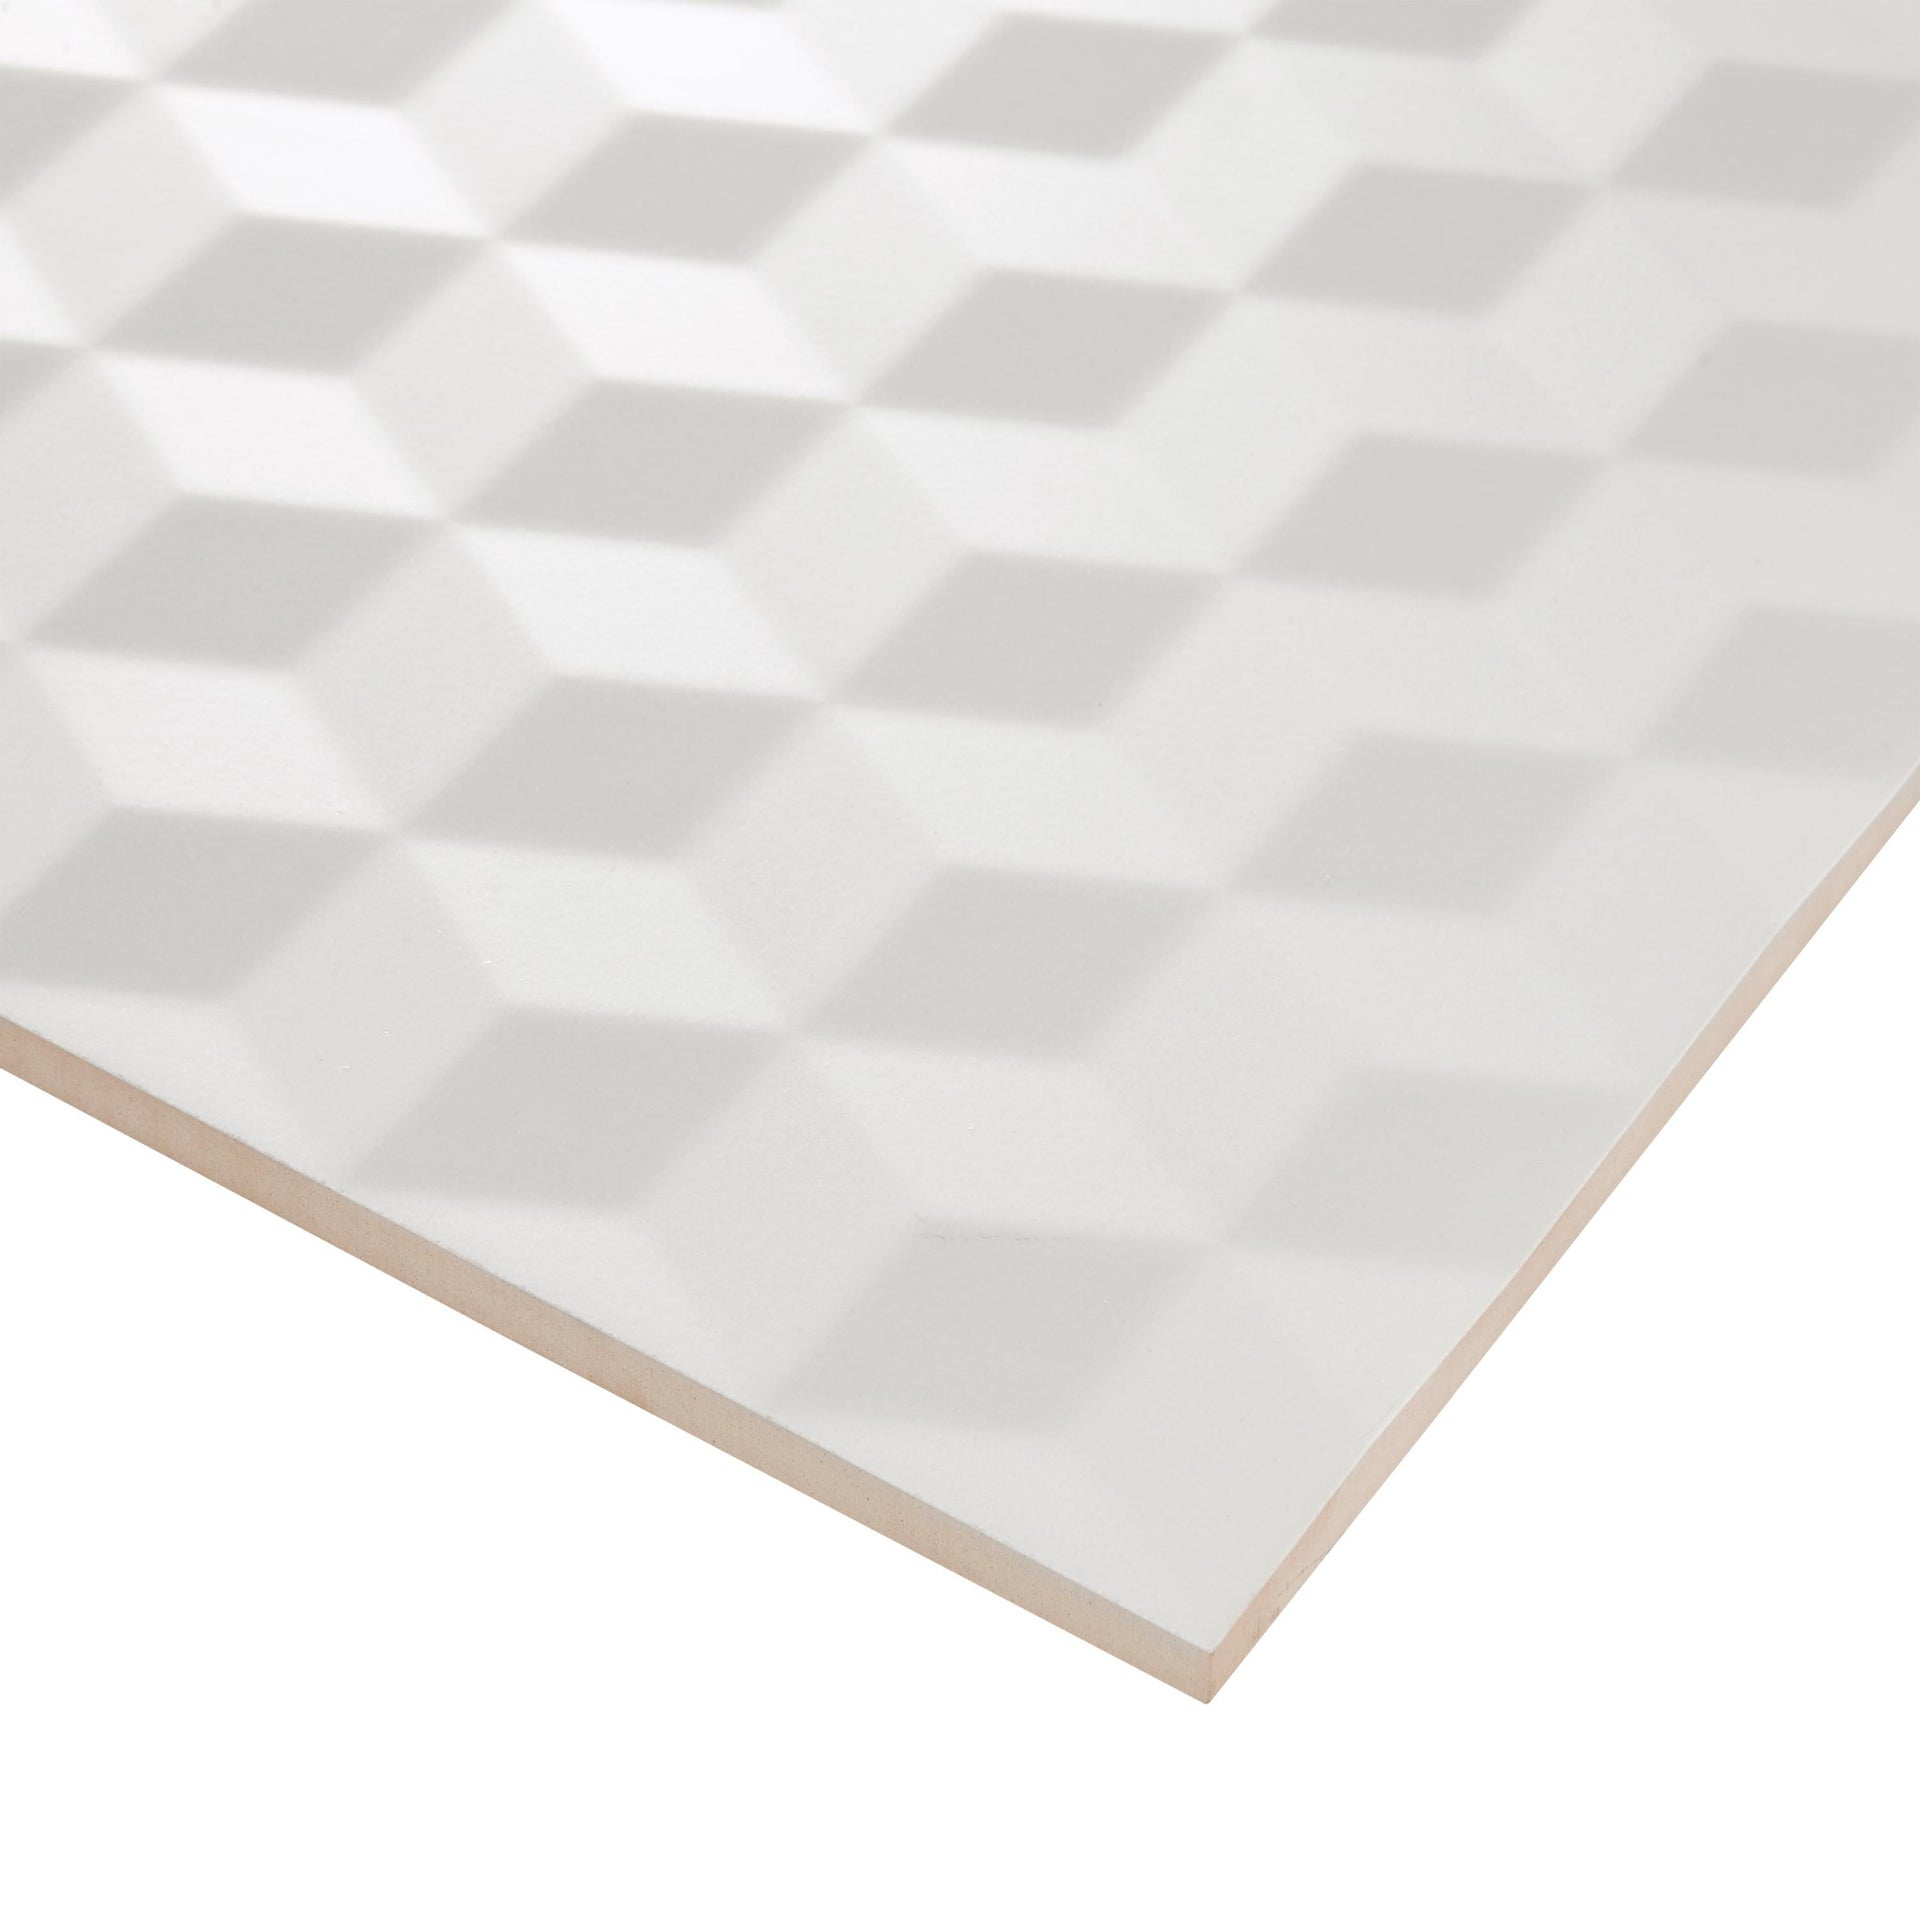 Piastrella per rivestimenti Arctic 30 x 60 cm sp. 9 mm bianco - 2